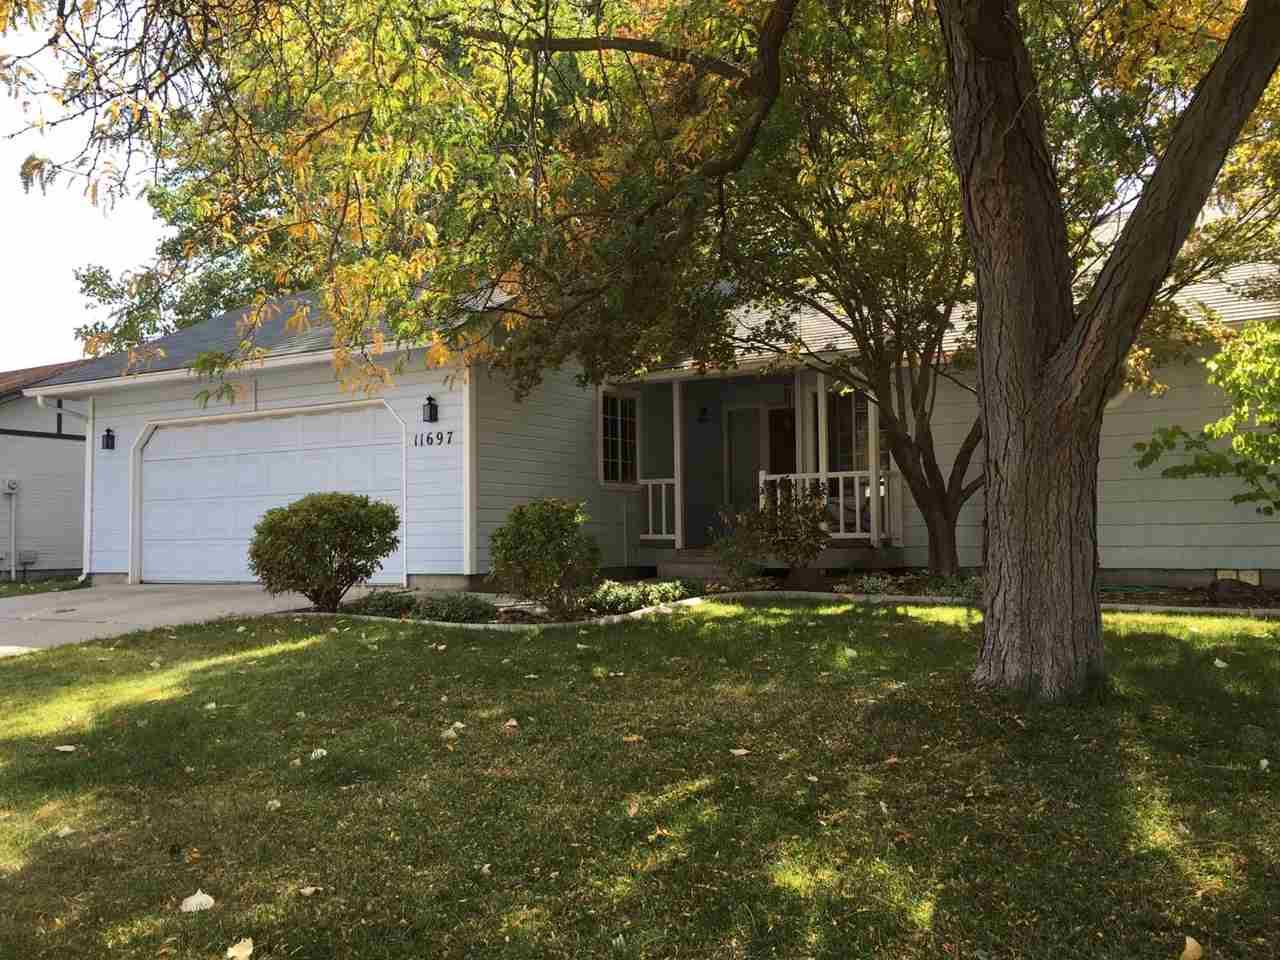 11697 W Hinsdale Court, Boise, ID 83713